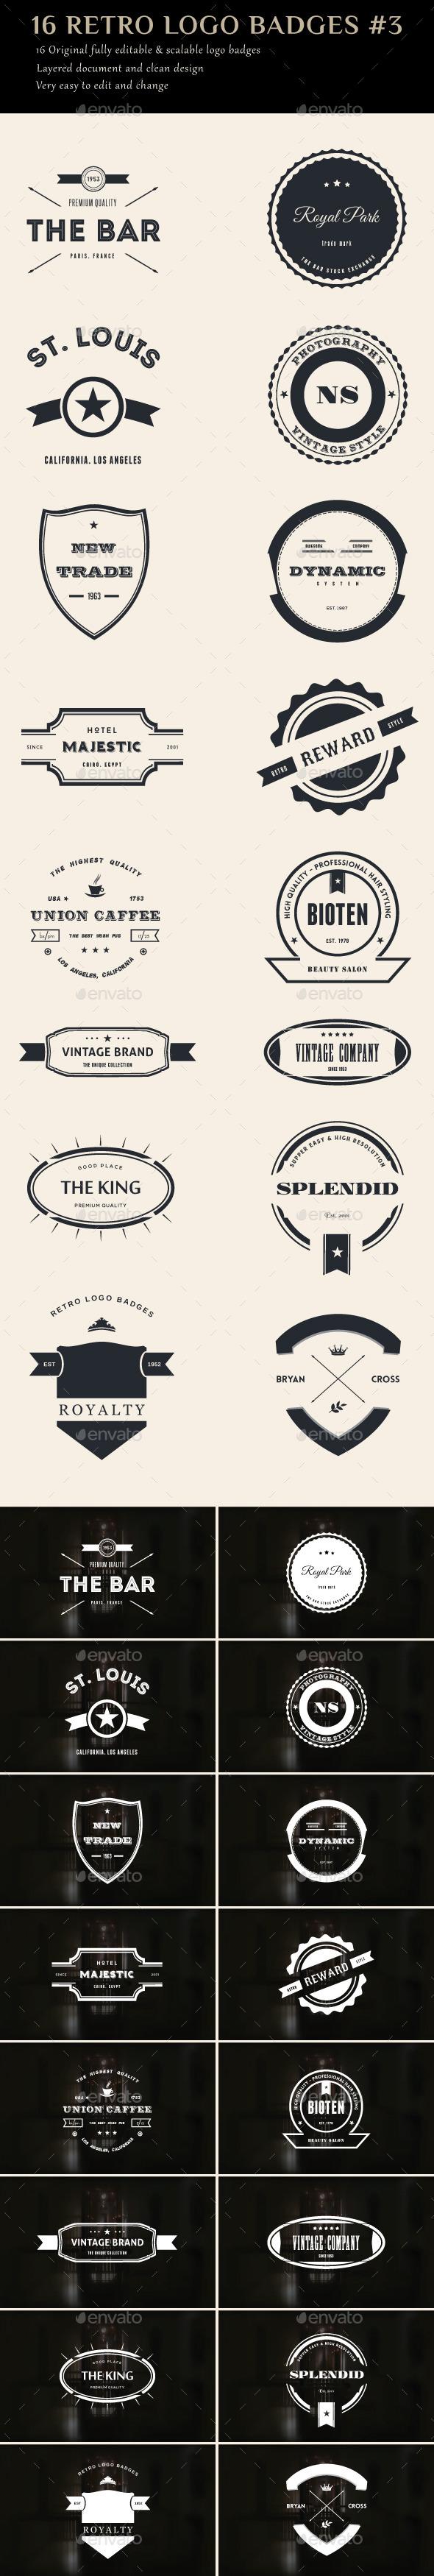 16 Retro Logo Badges #3 - Badges & Stickers Web Elements